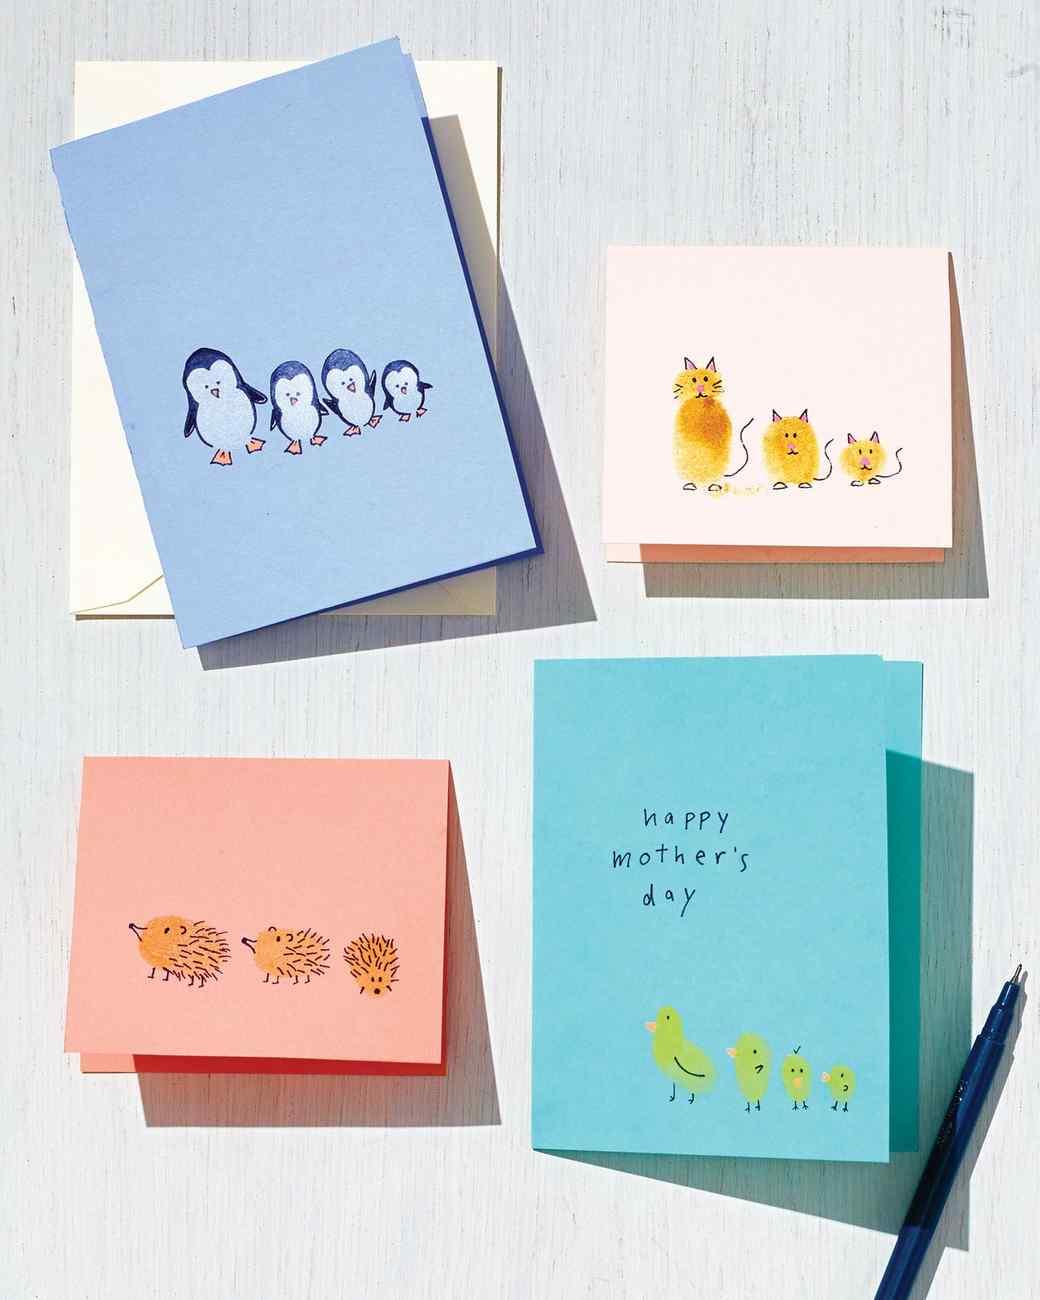 thumbprint-cards-316-d112850.jpg